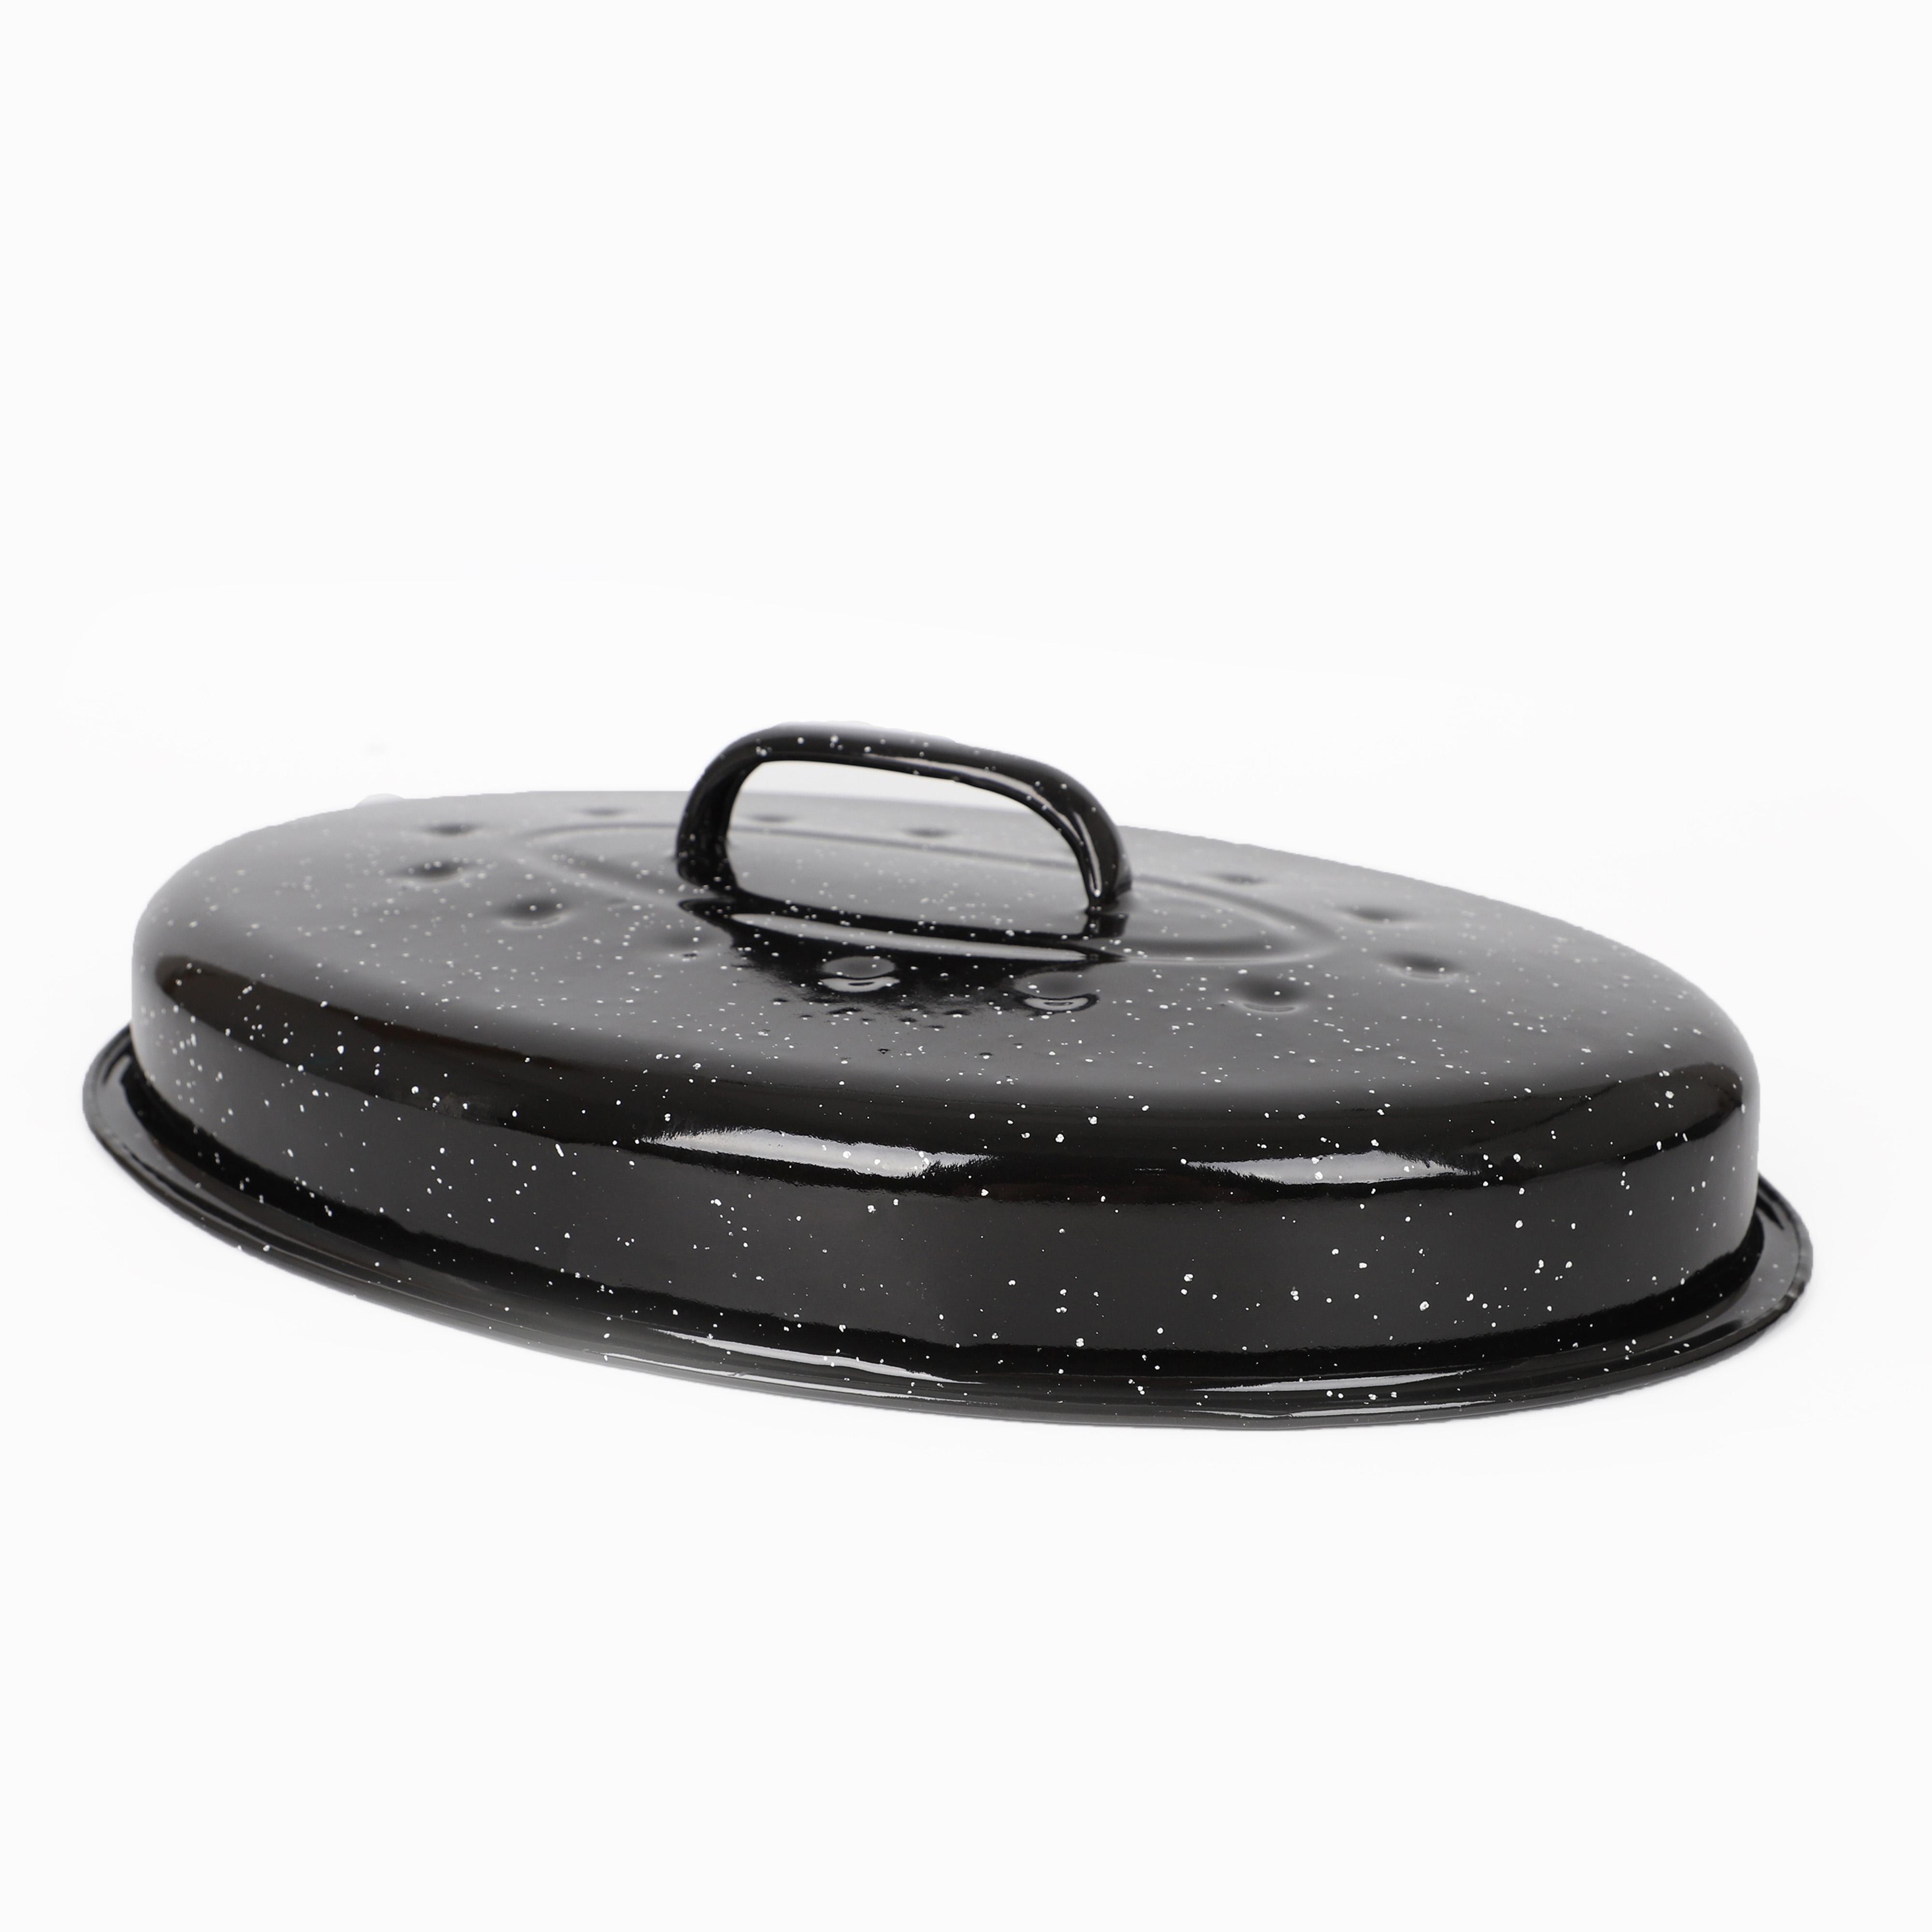 Kitchen Granite Ware Enamel On Steel Oval Roaster Covered Turkey Pan with Lid